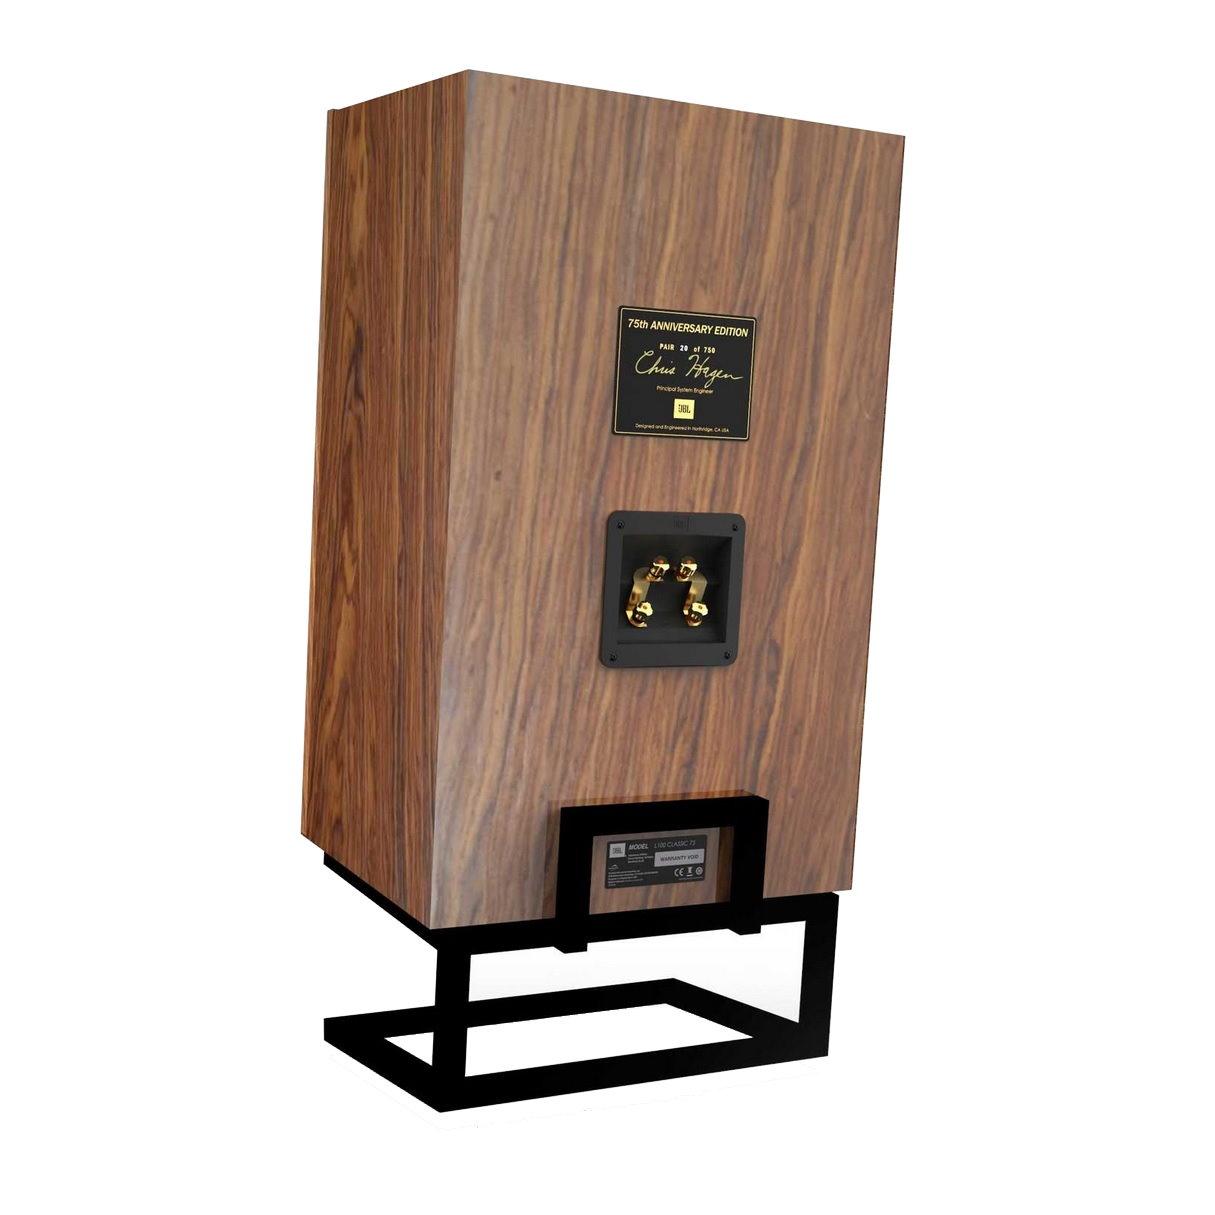 JBL L100 Classic 75 Limited Edition Loudspeakers